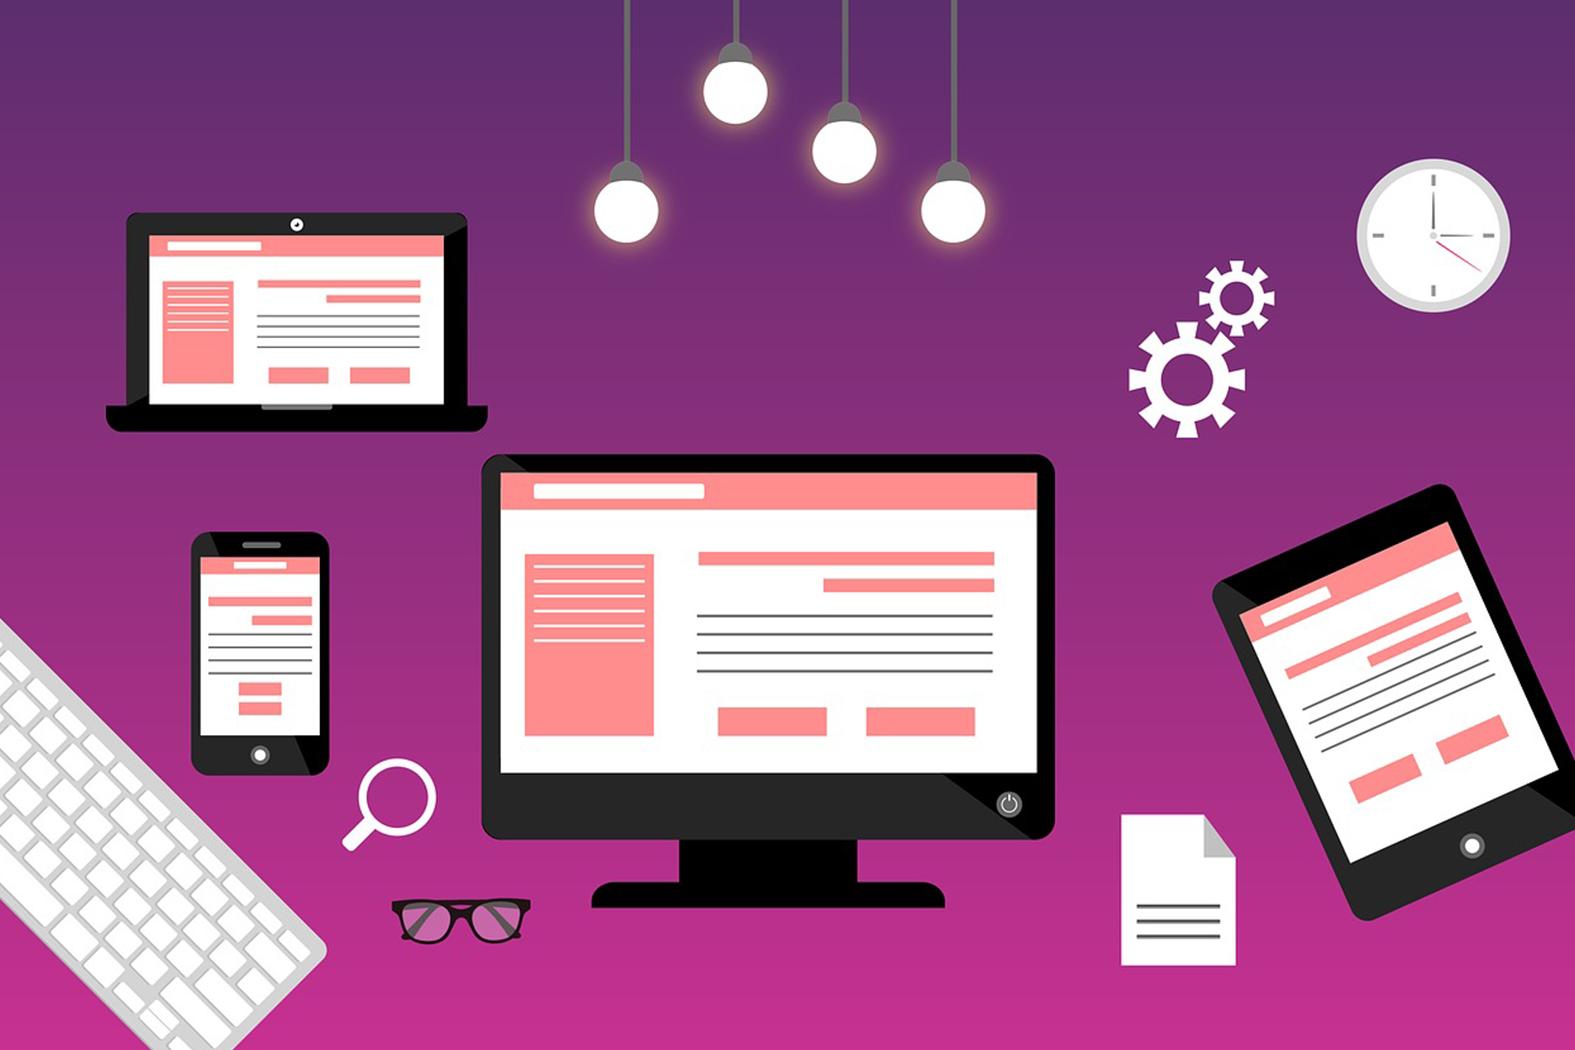 A ATA explica como o Brand Content pode auxiliar sua empresa 2